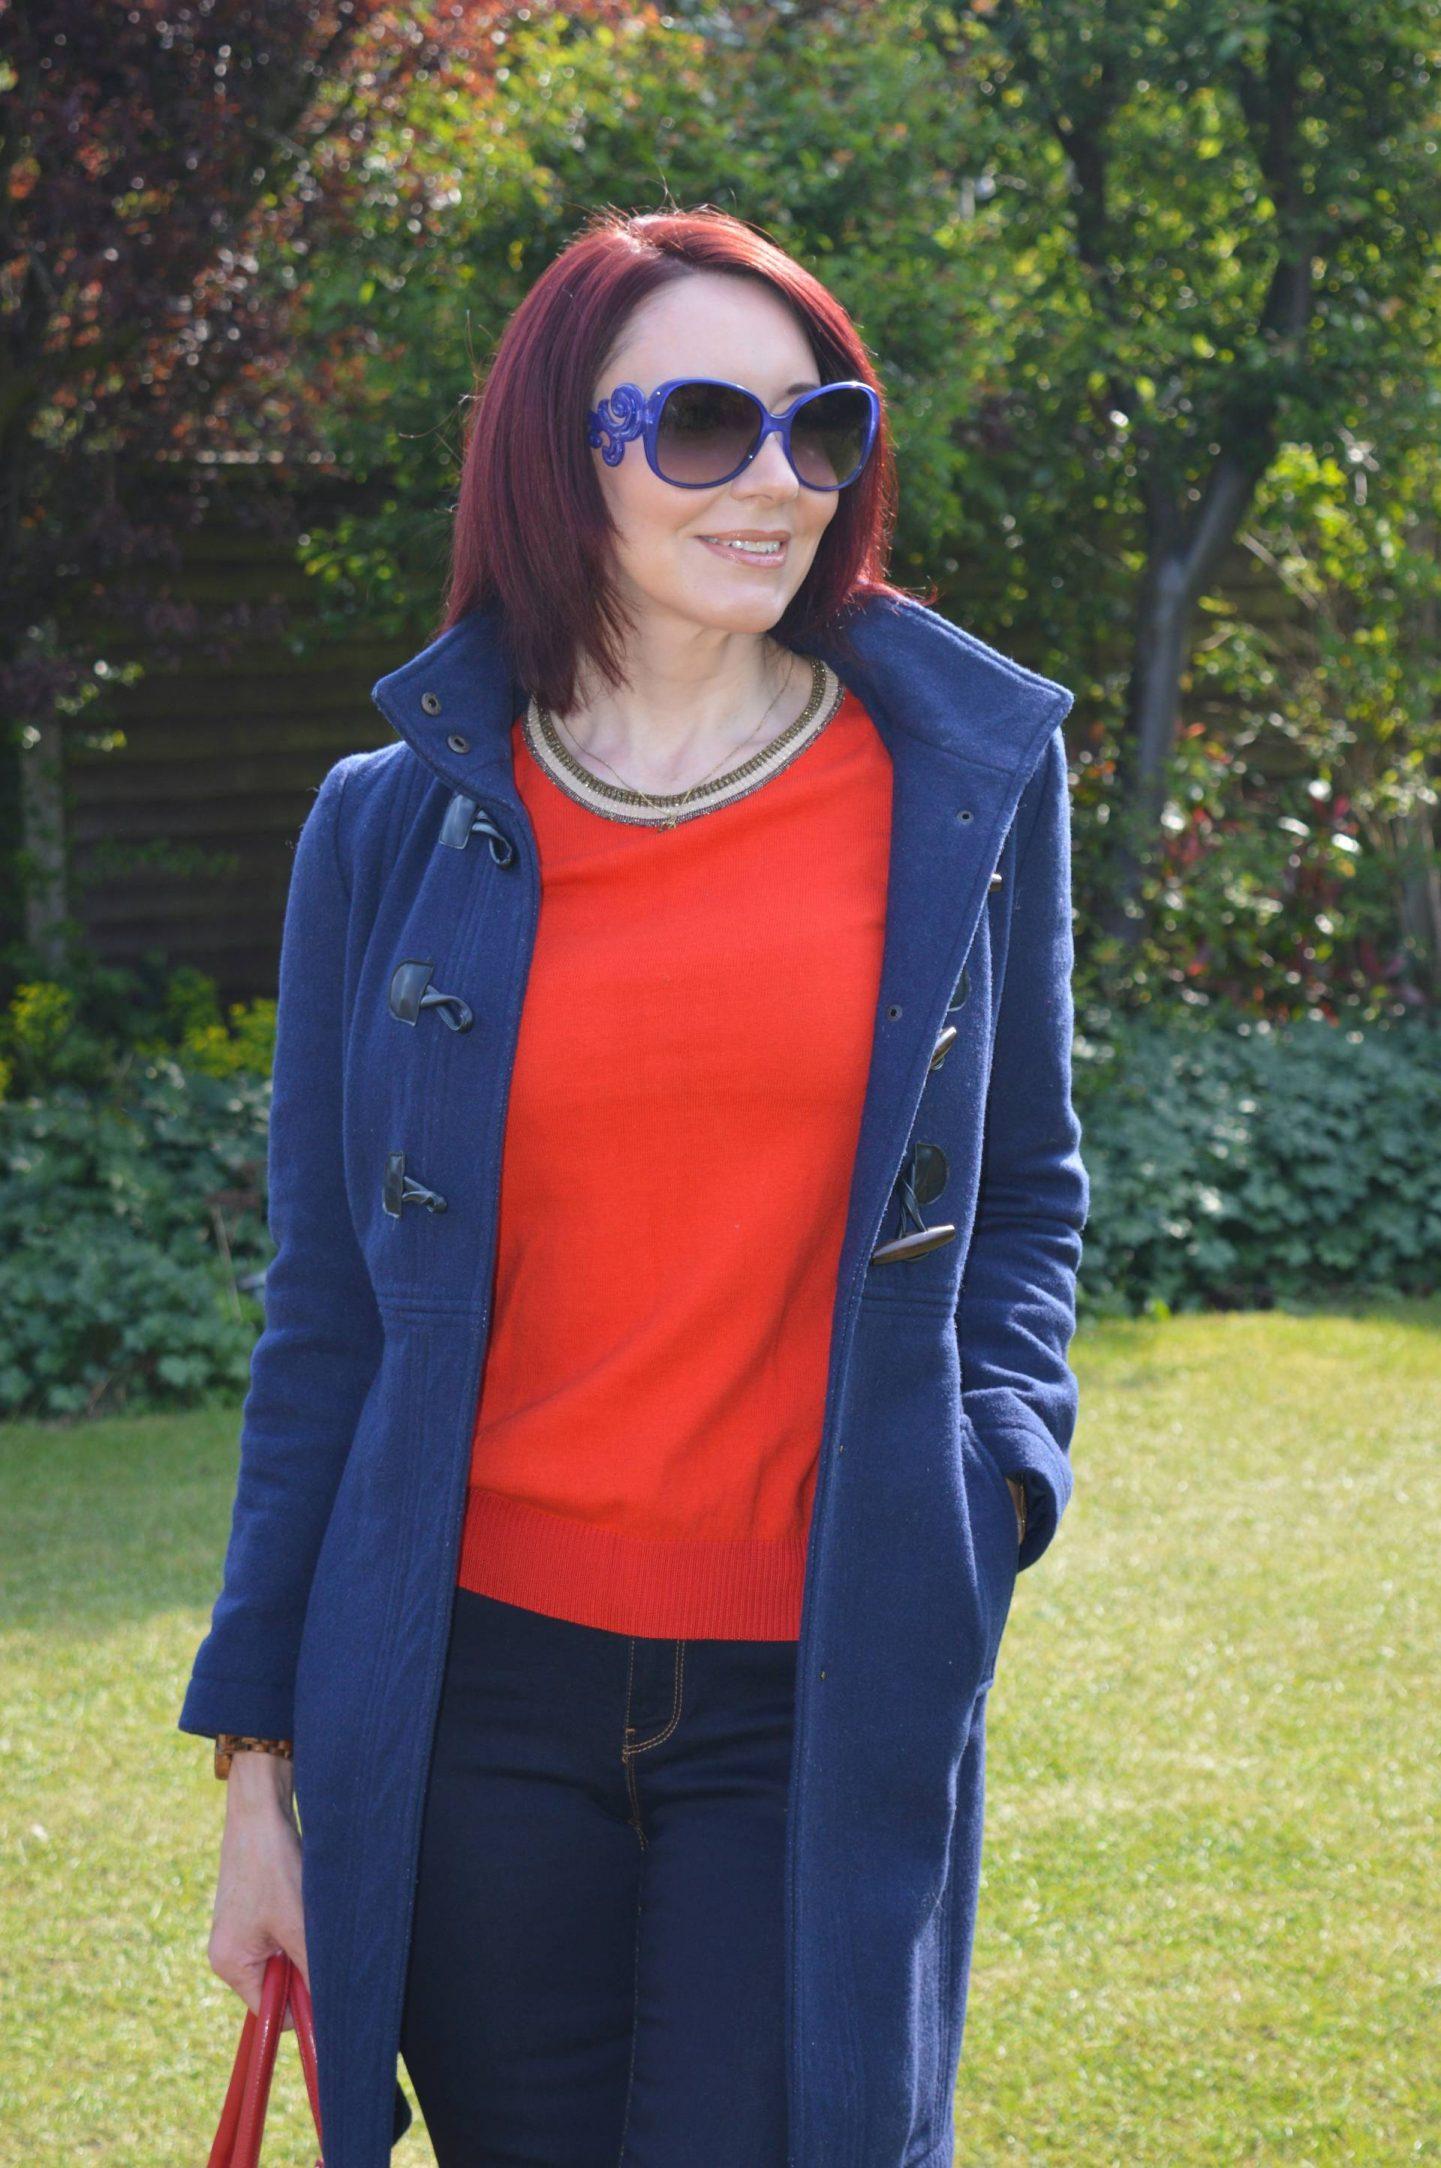 Scotch & Soda red jumper, Dickins & Jones duffle coat